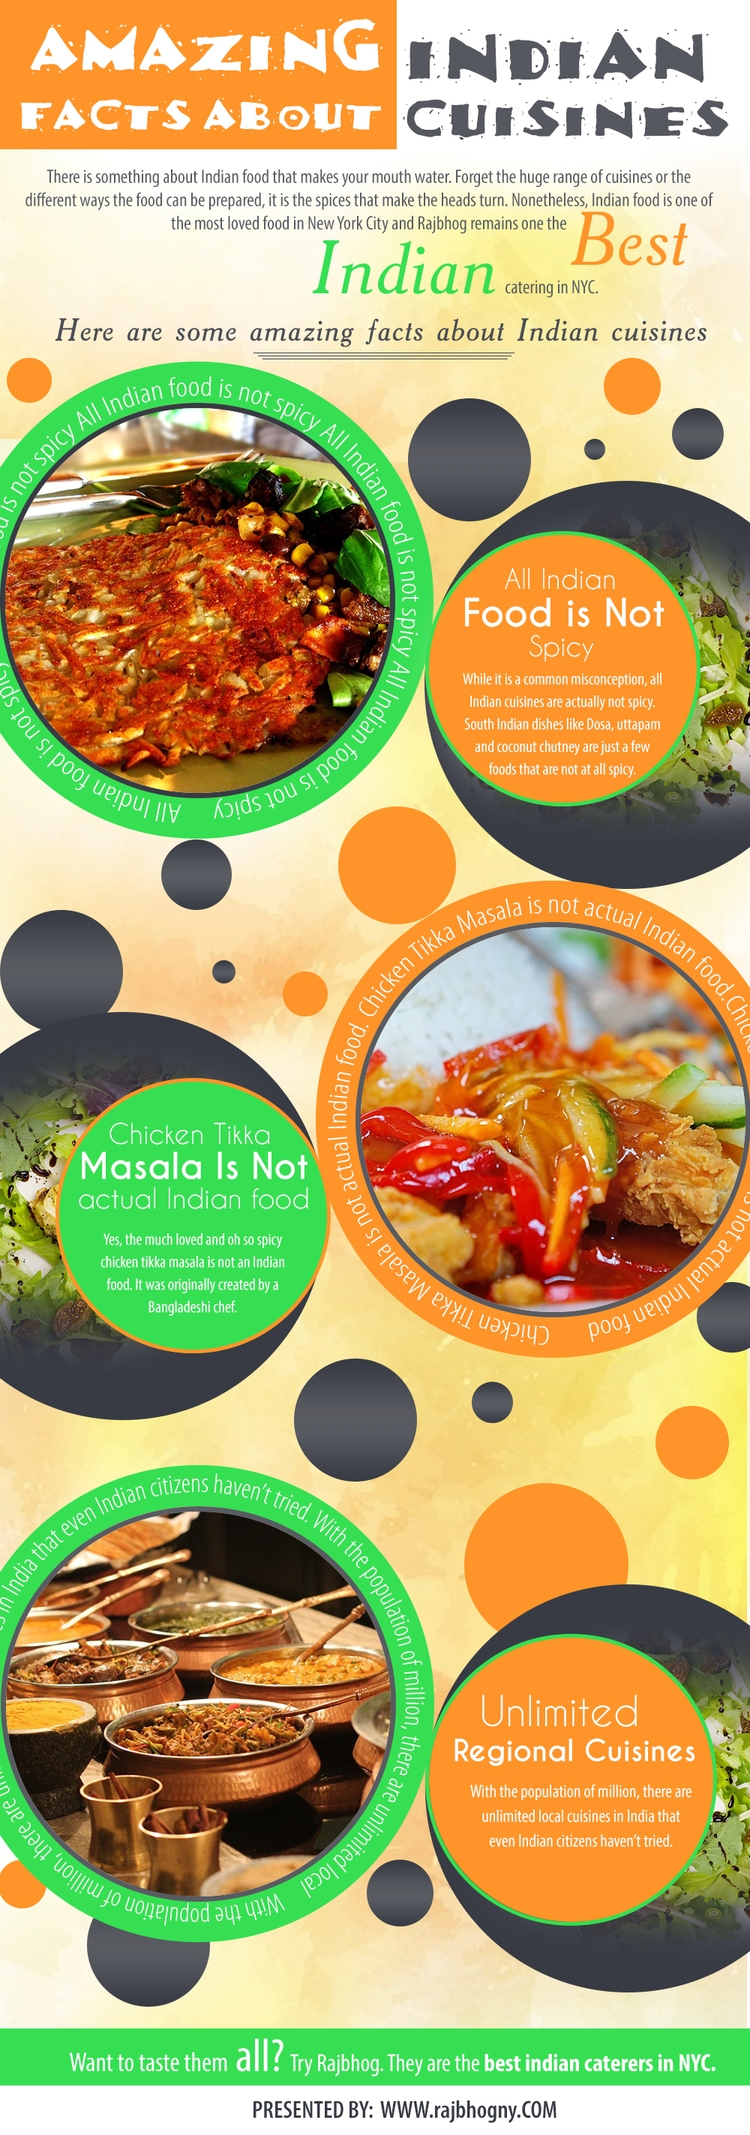 Rajbhog Catering service top ma - rajbhogny | ello